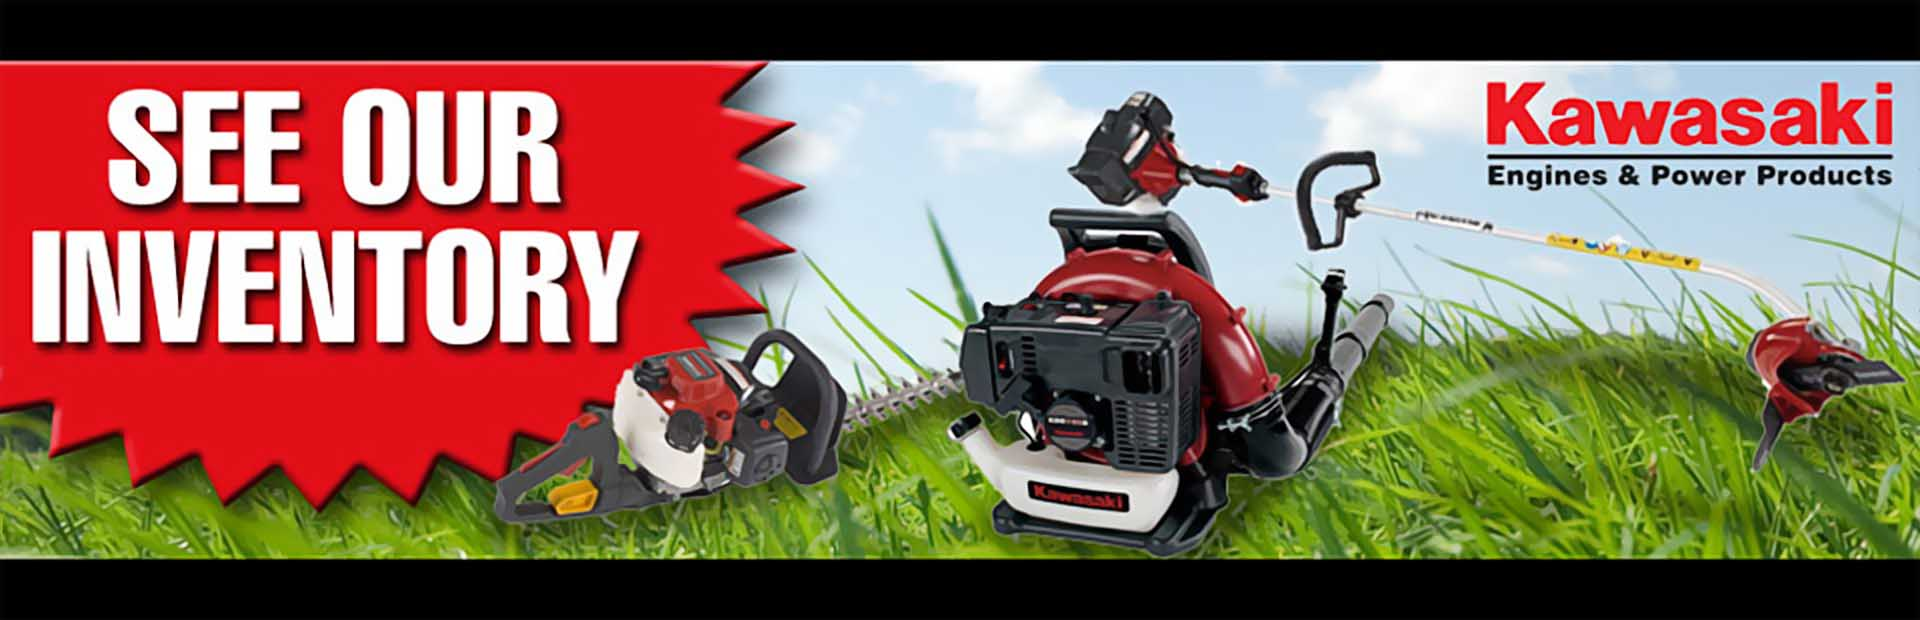 find your hustler lawn mower, parts, outdoor power equipment